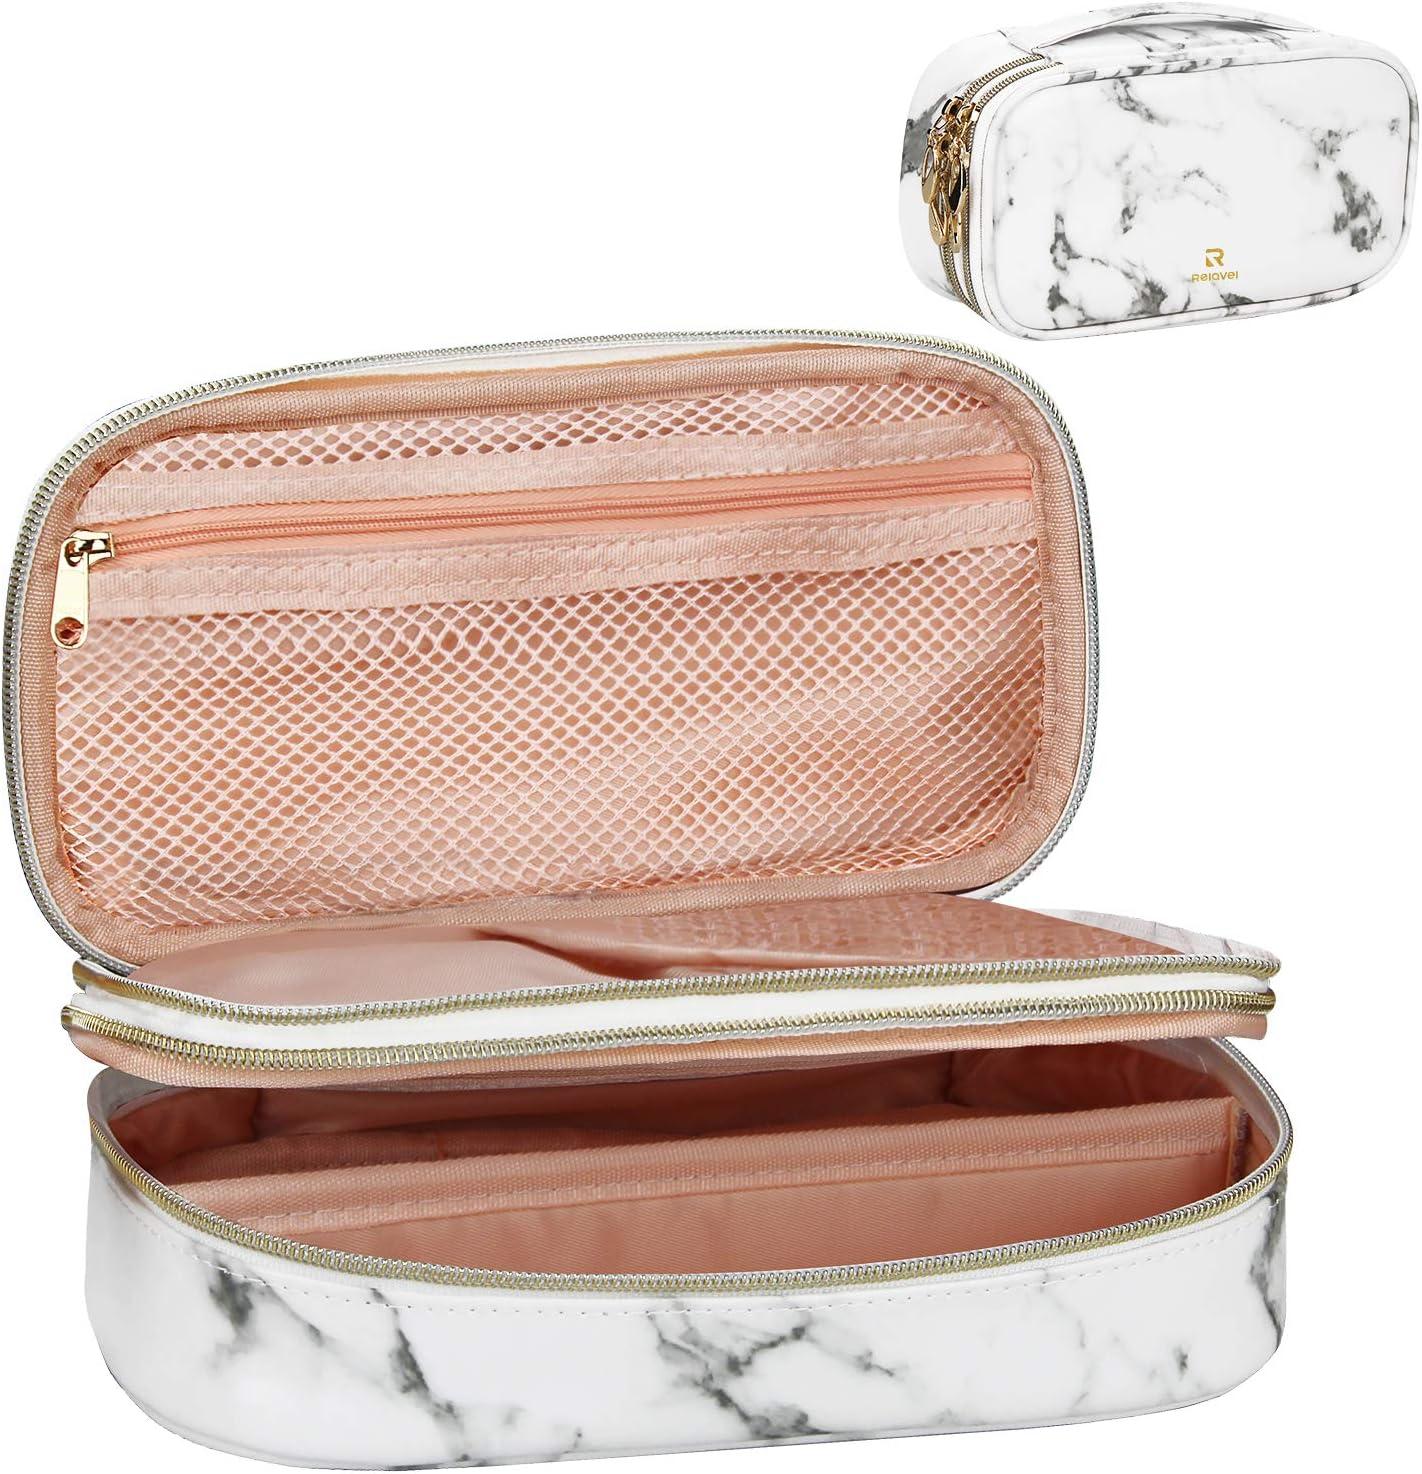 Relavel Makeup Bag Makeup Case 2-Layer Cosmetic Brush Bag Marble Makeup bag Makeup Organizers and Storage Cosmetic Travel Bag for Professional Makeup Brushes Storage Box (Marble White Pattern)